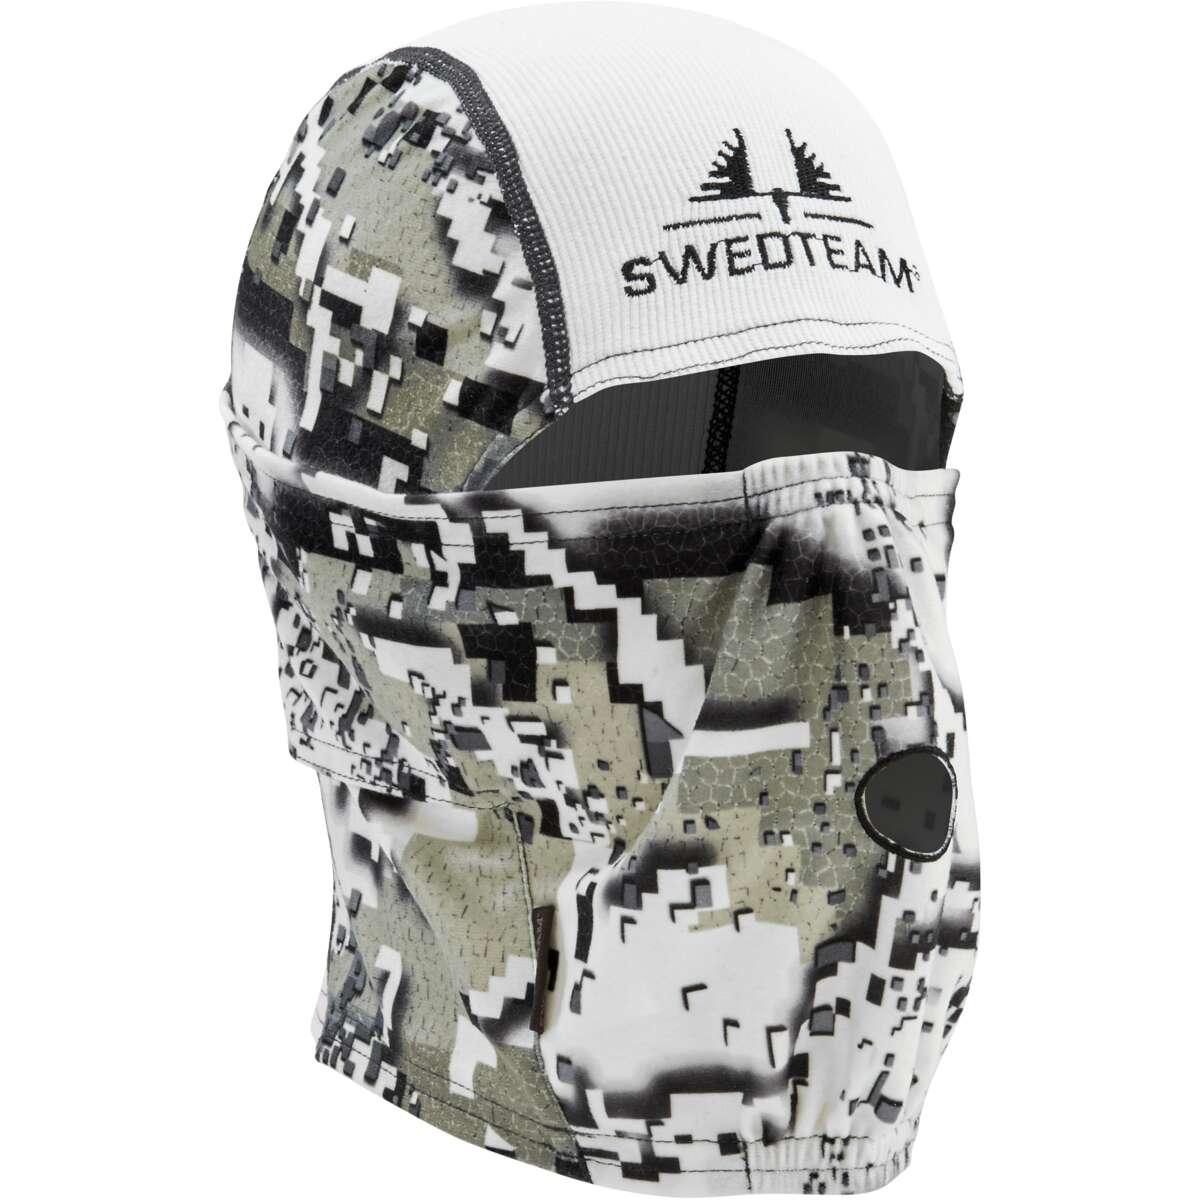 Swedteam Ridge Camouflage hood, Zero naamiohuppu